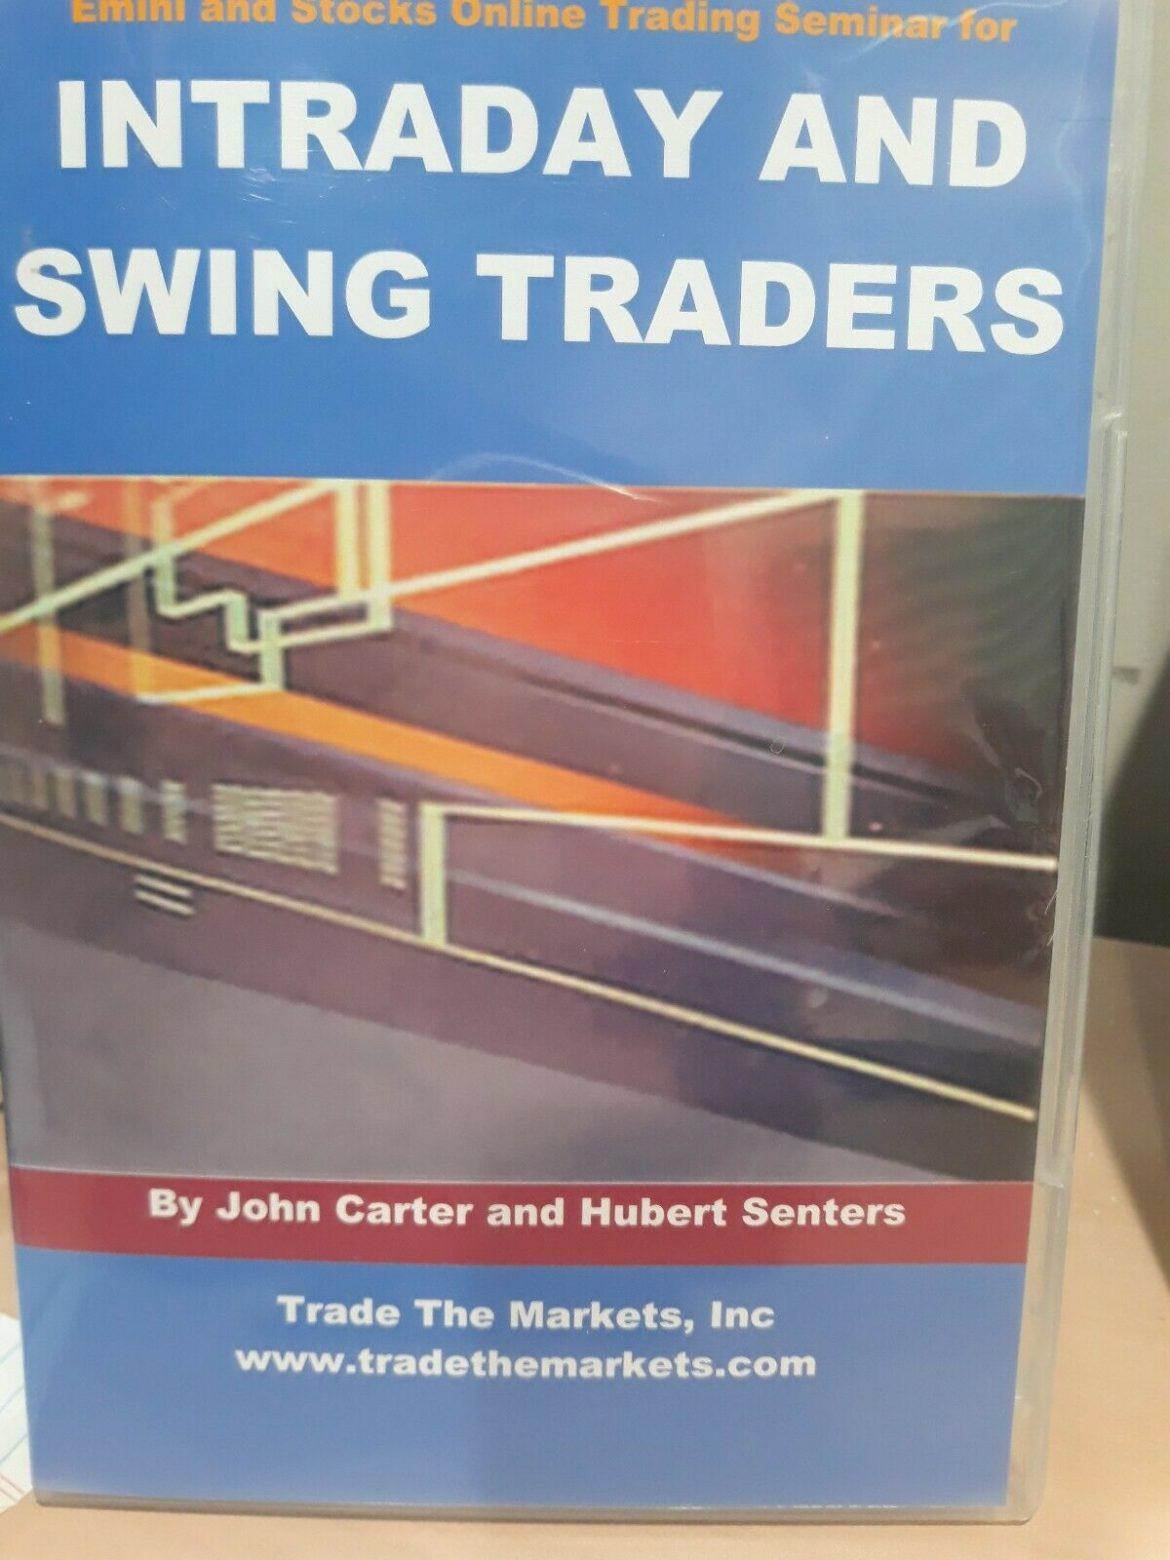 E-Mini & Stocks Online Trading Seminar Intraday Swing & Traders John Carter